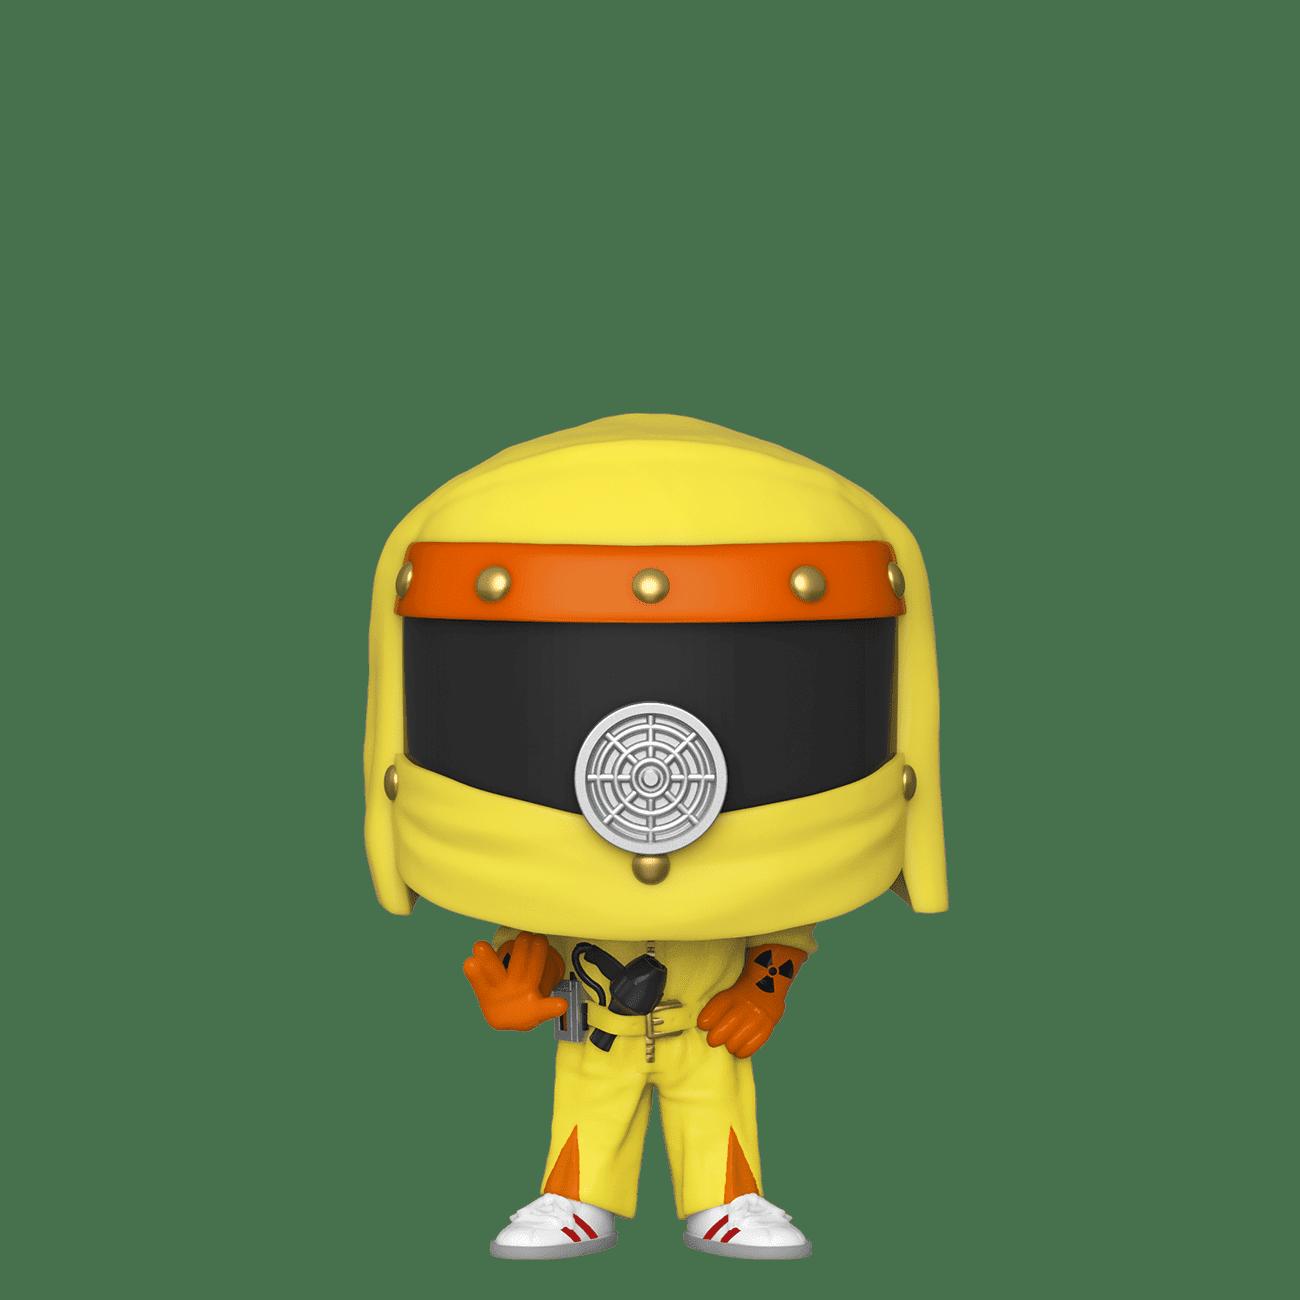 Funko Pop Marty McFly Hazmat Suit NYCC 2019